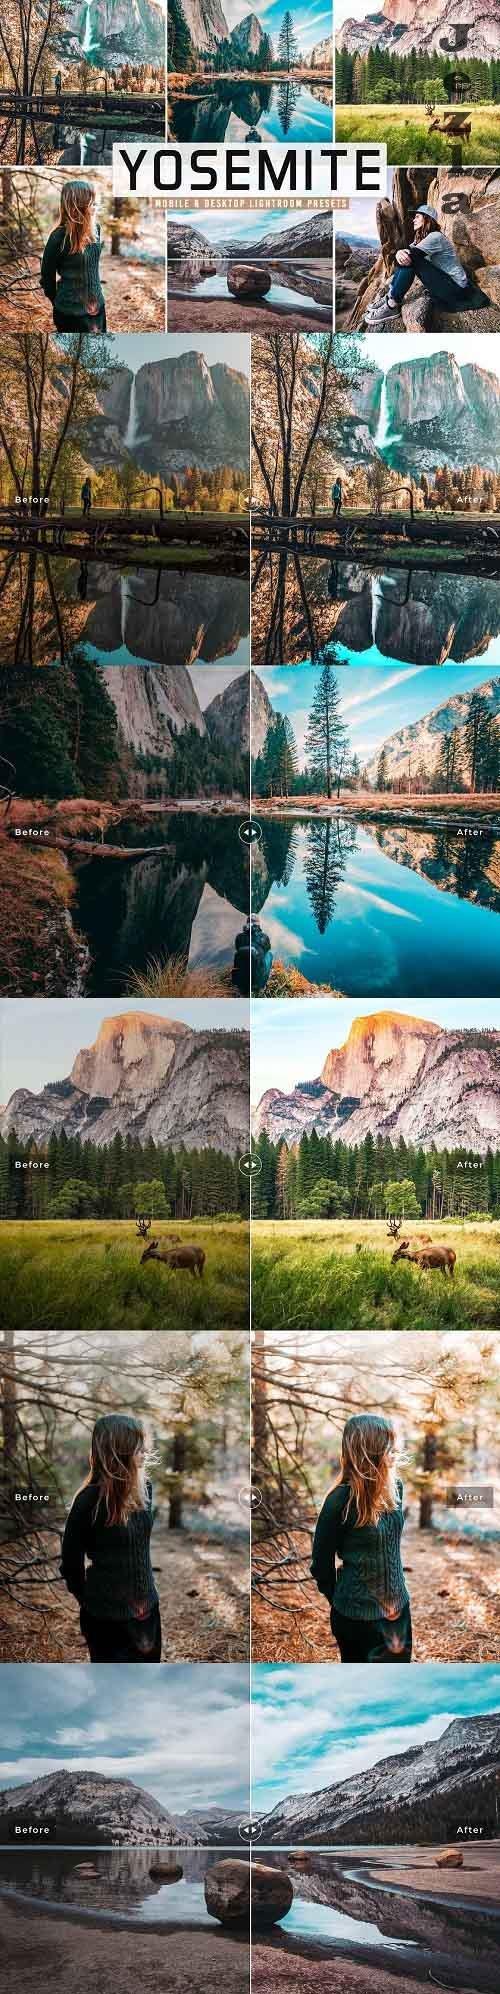 Yosemite Pro Lightroom Presets - 5479344 - Mobile & Desktop